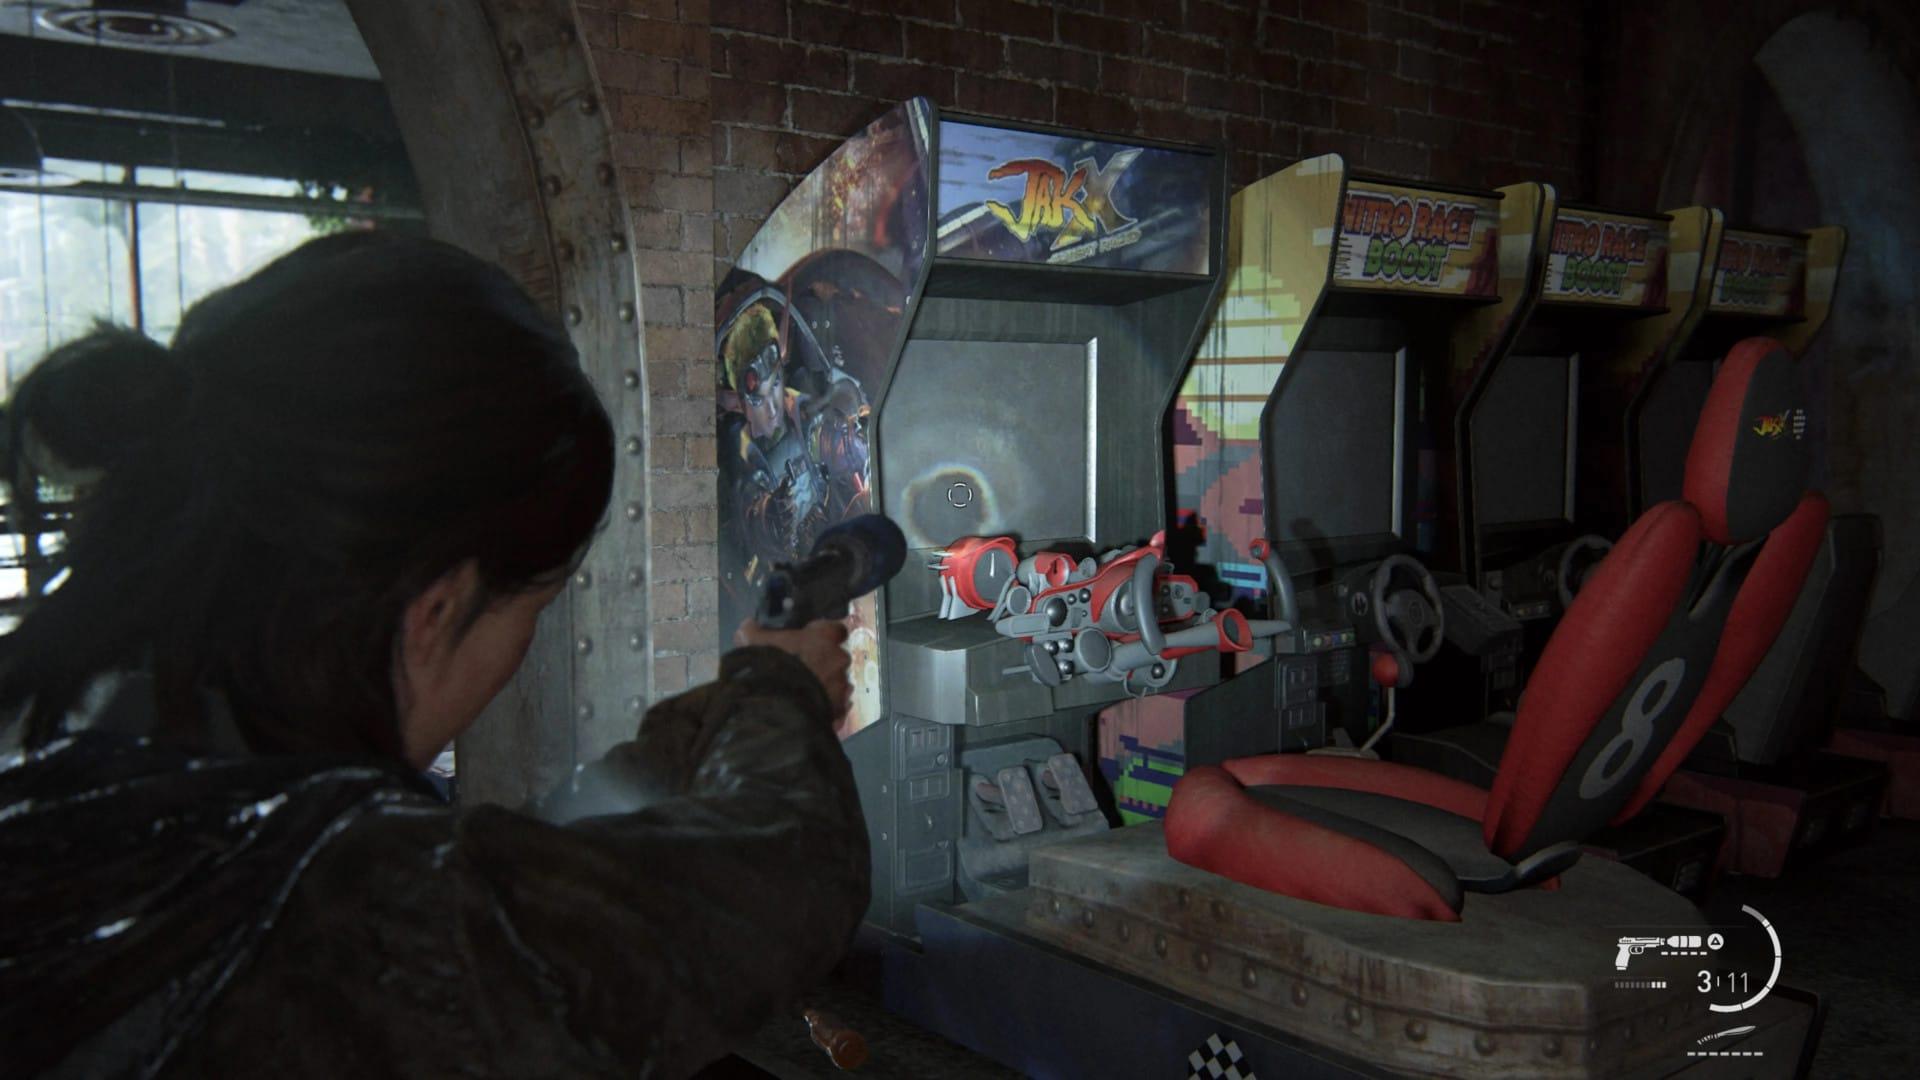 immersive sim sims Deathloop BioShock The Elder Scrolls The Legend of Zelda: Breath of the Wild The Last of Us Part II